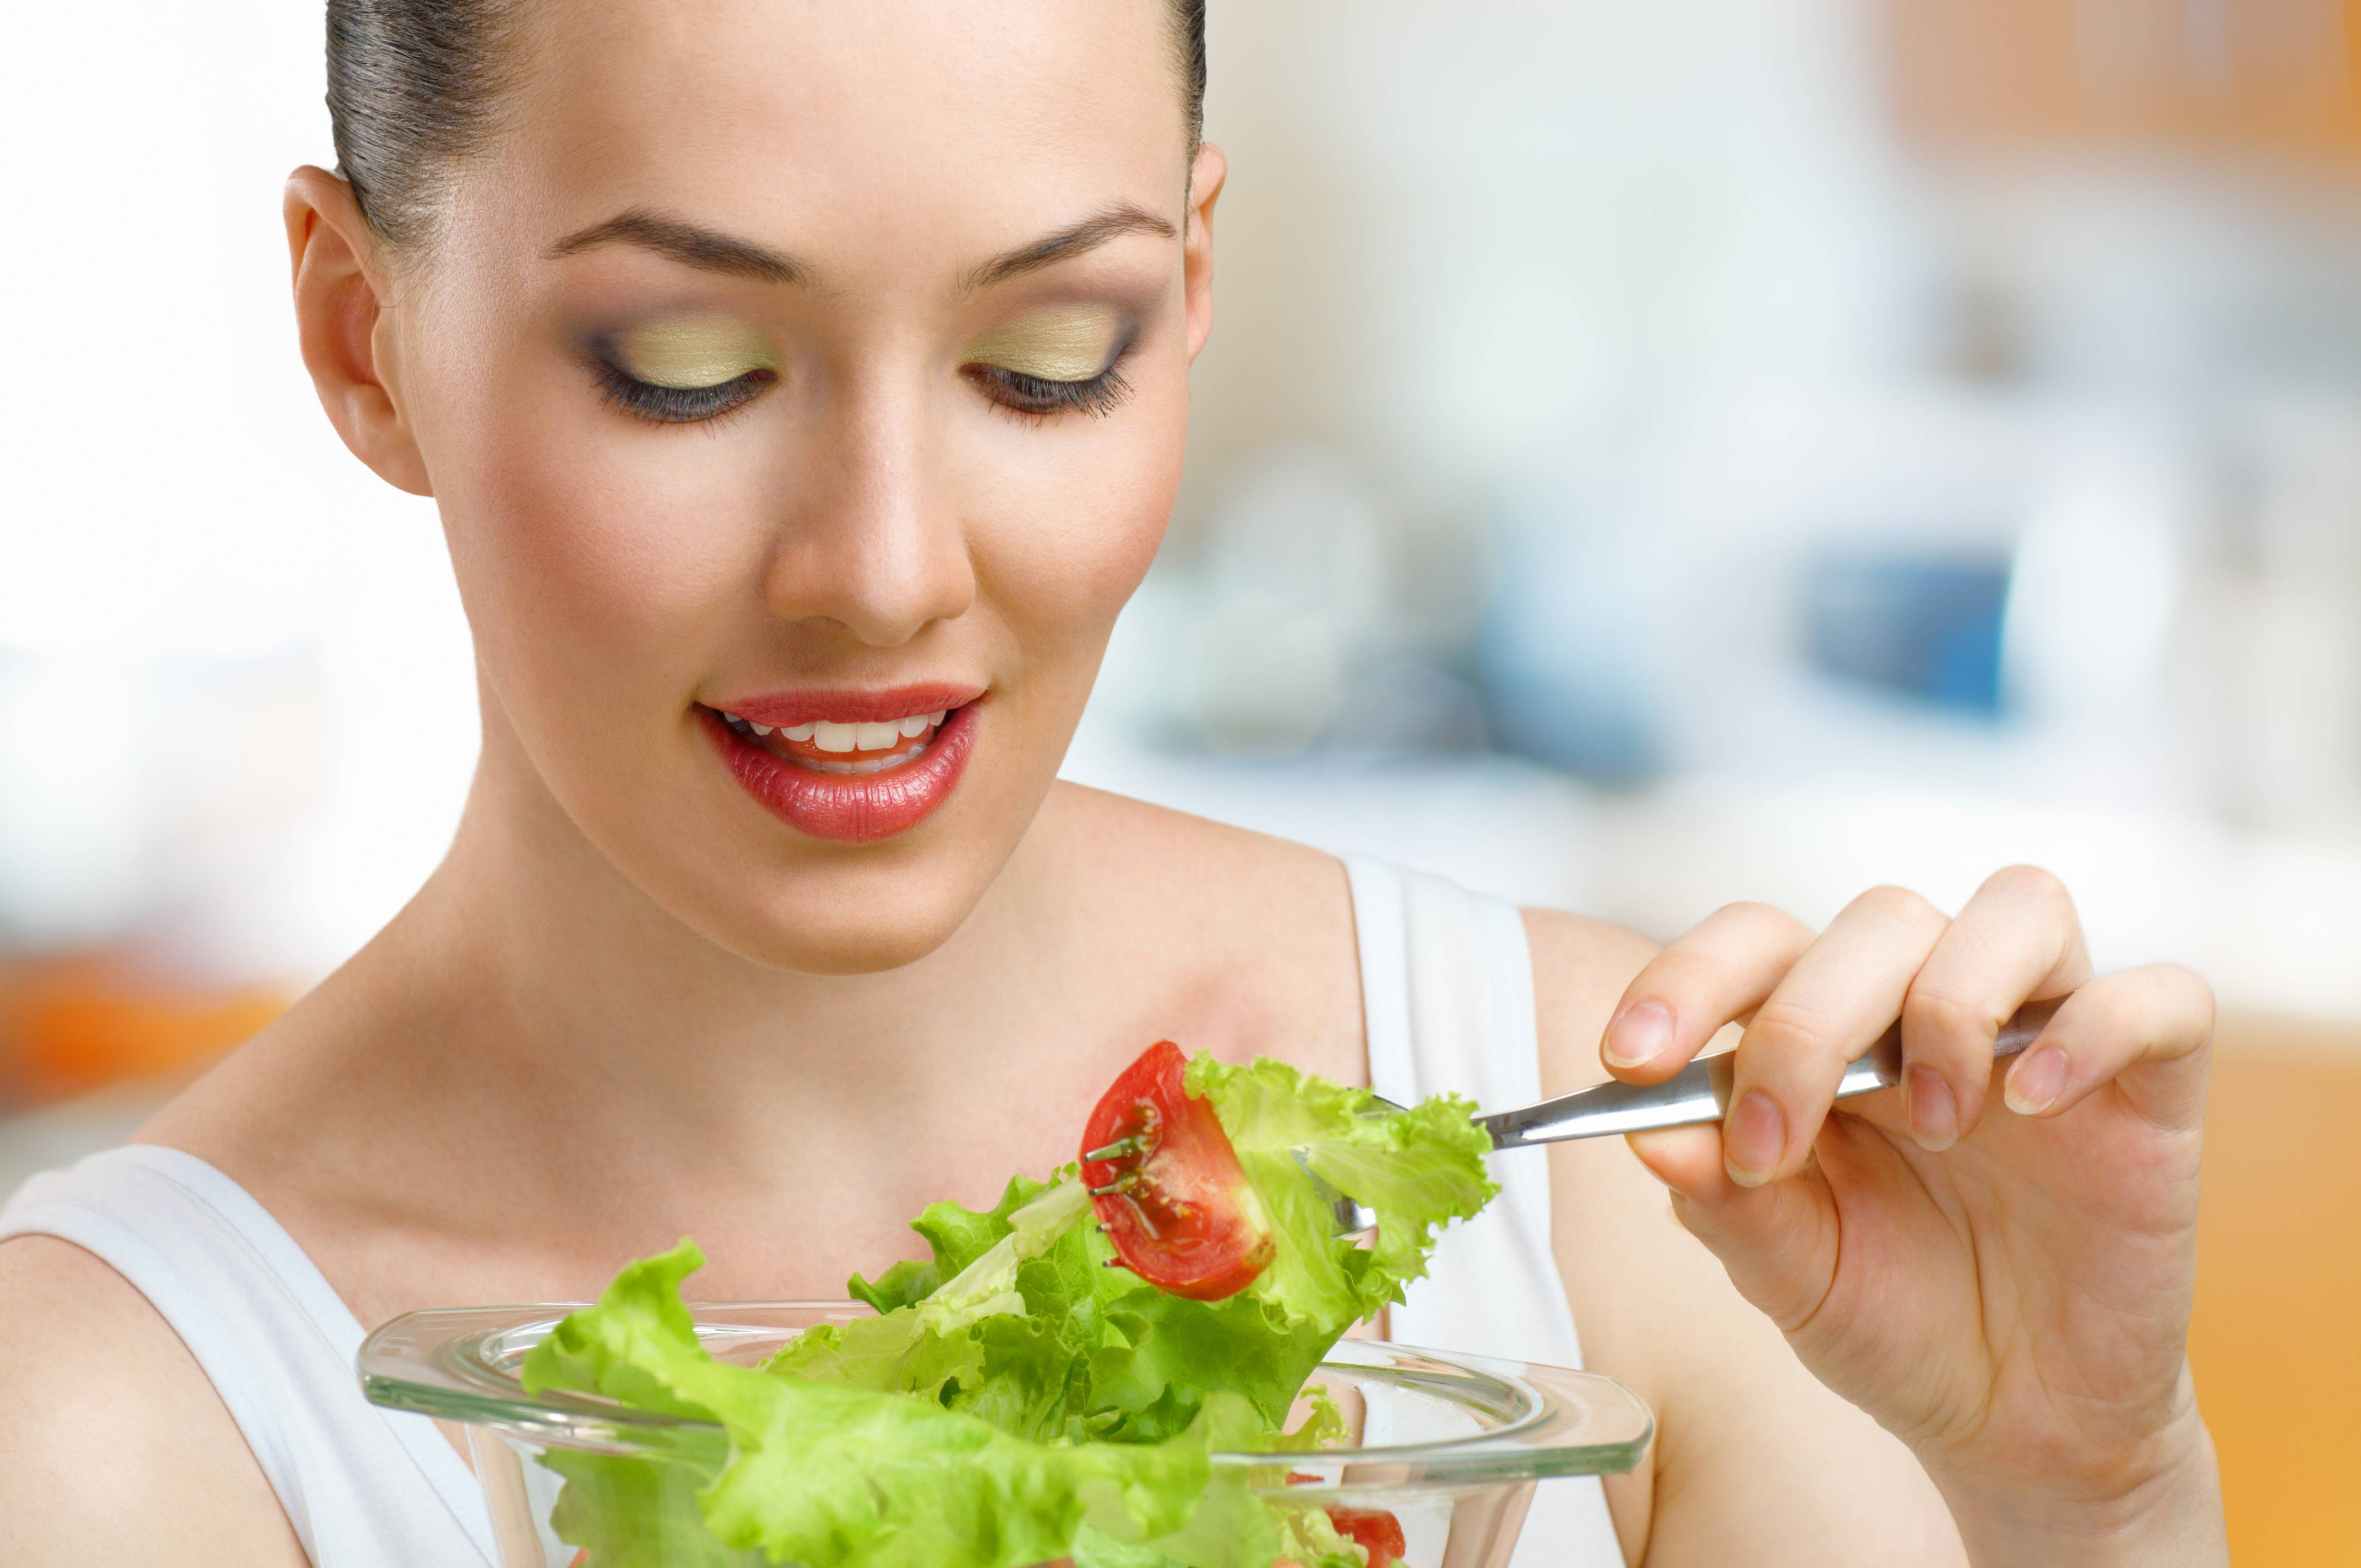 диета и образ жизни